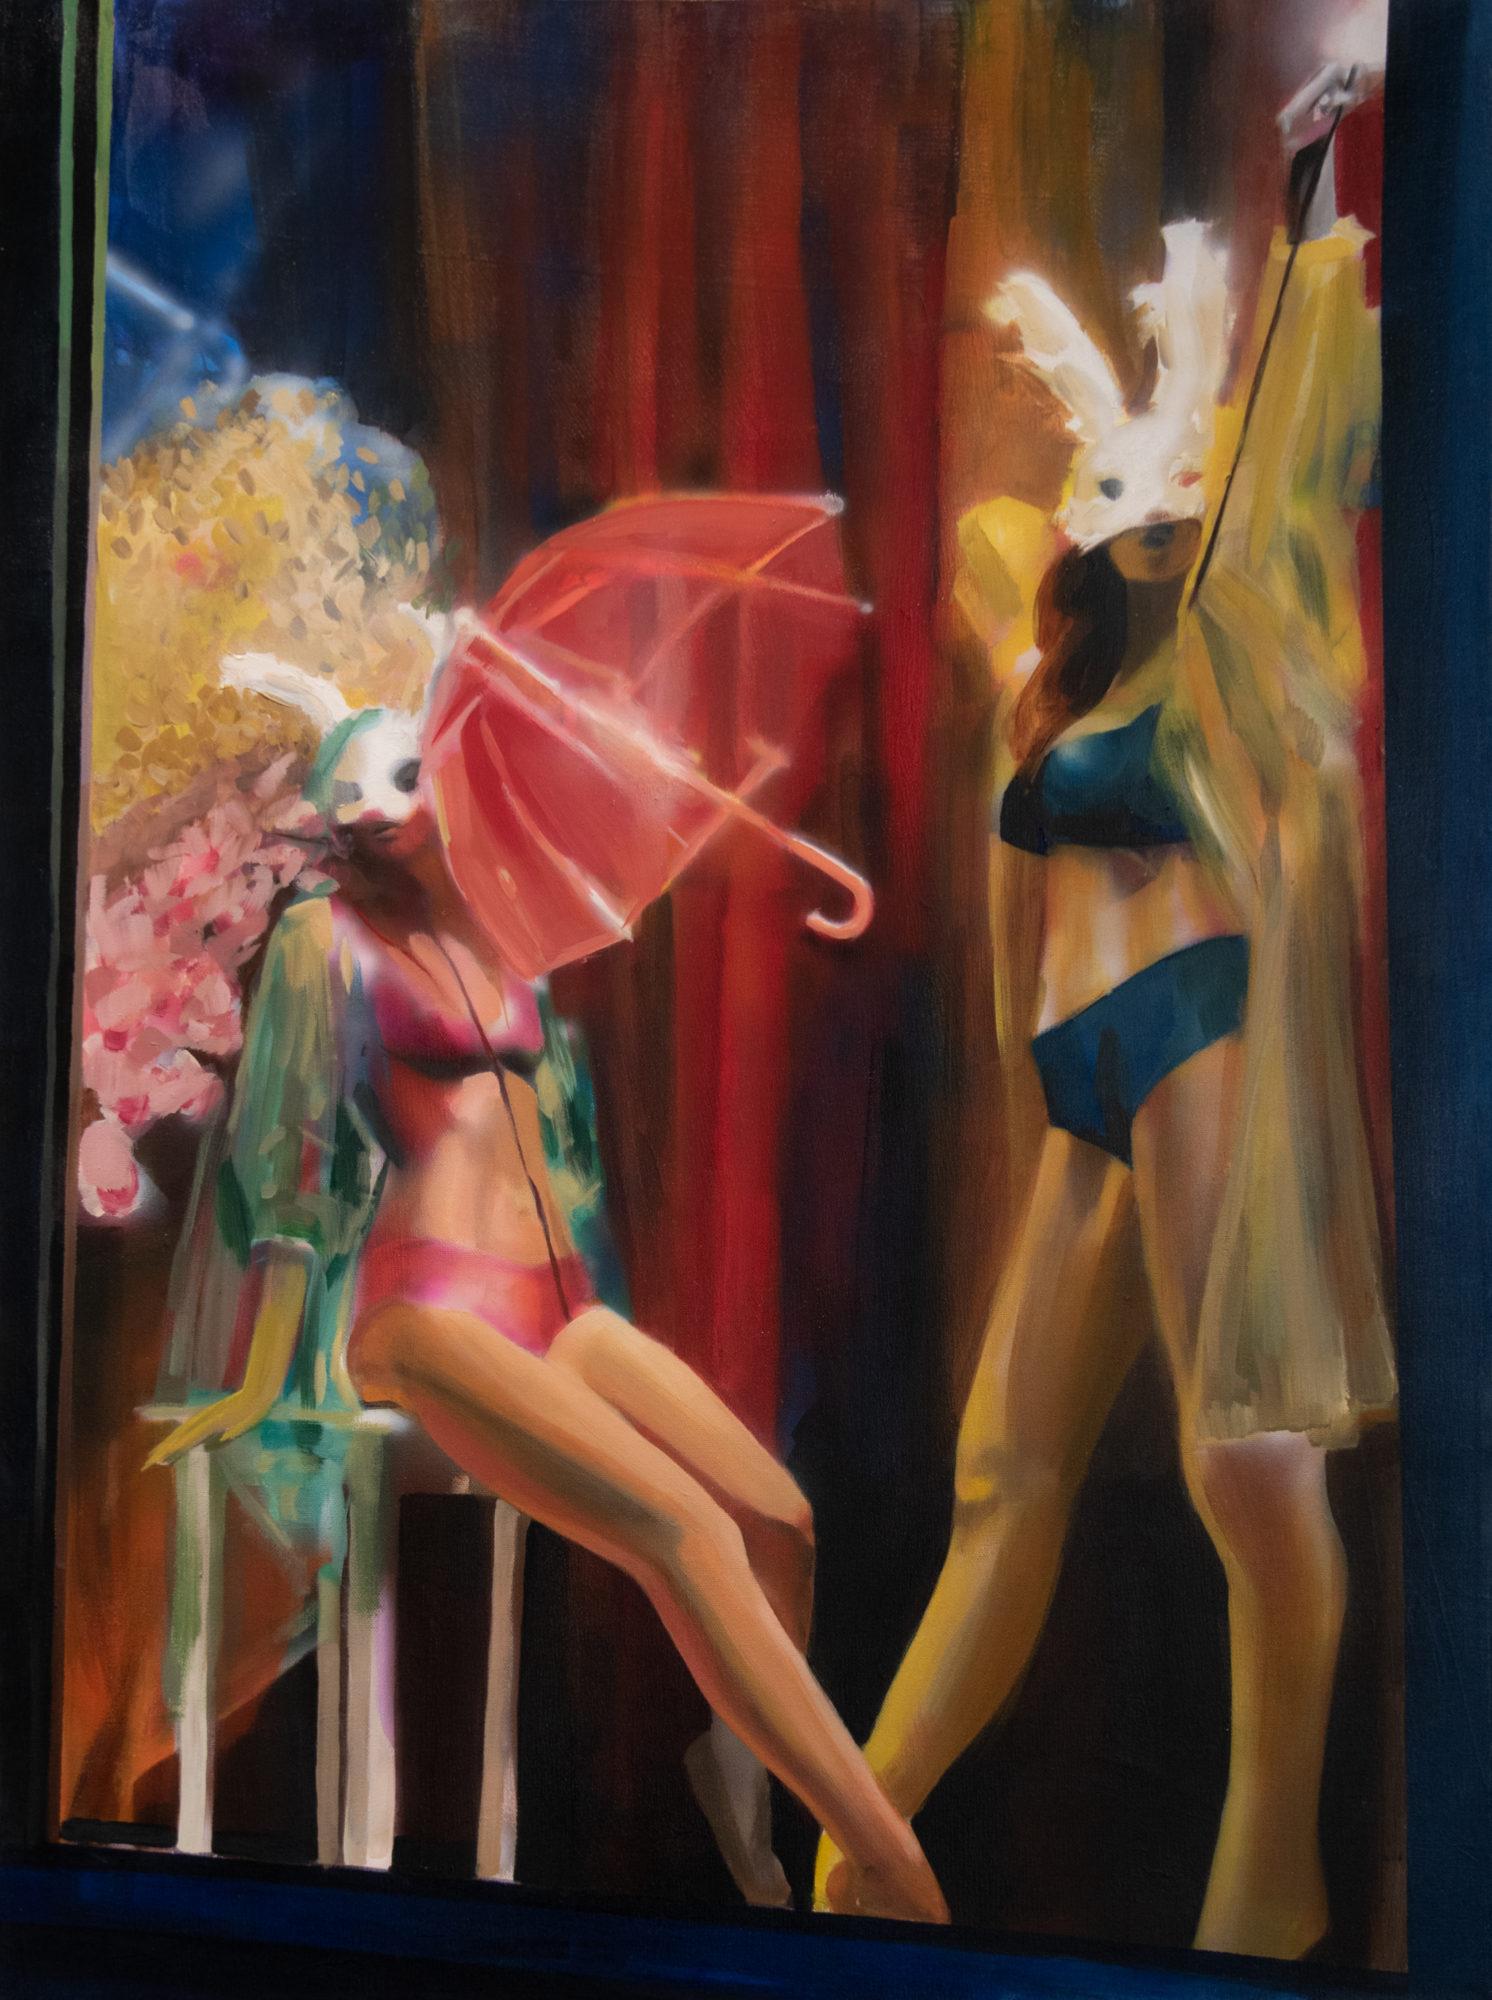 """Bright-Eyed and Bushy-Tailed"", Alyssa Hood, 2019, acrylic on canvas, 40 x 30 in."